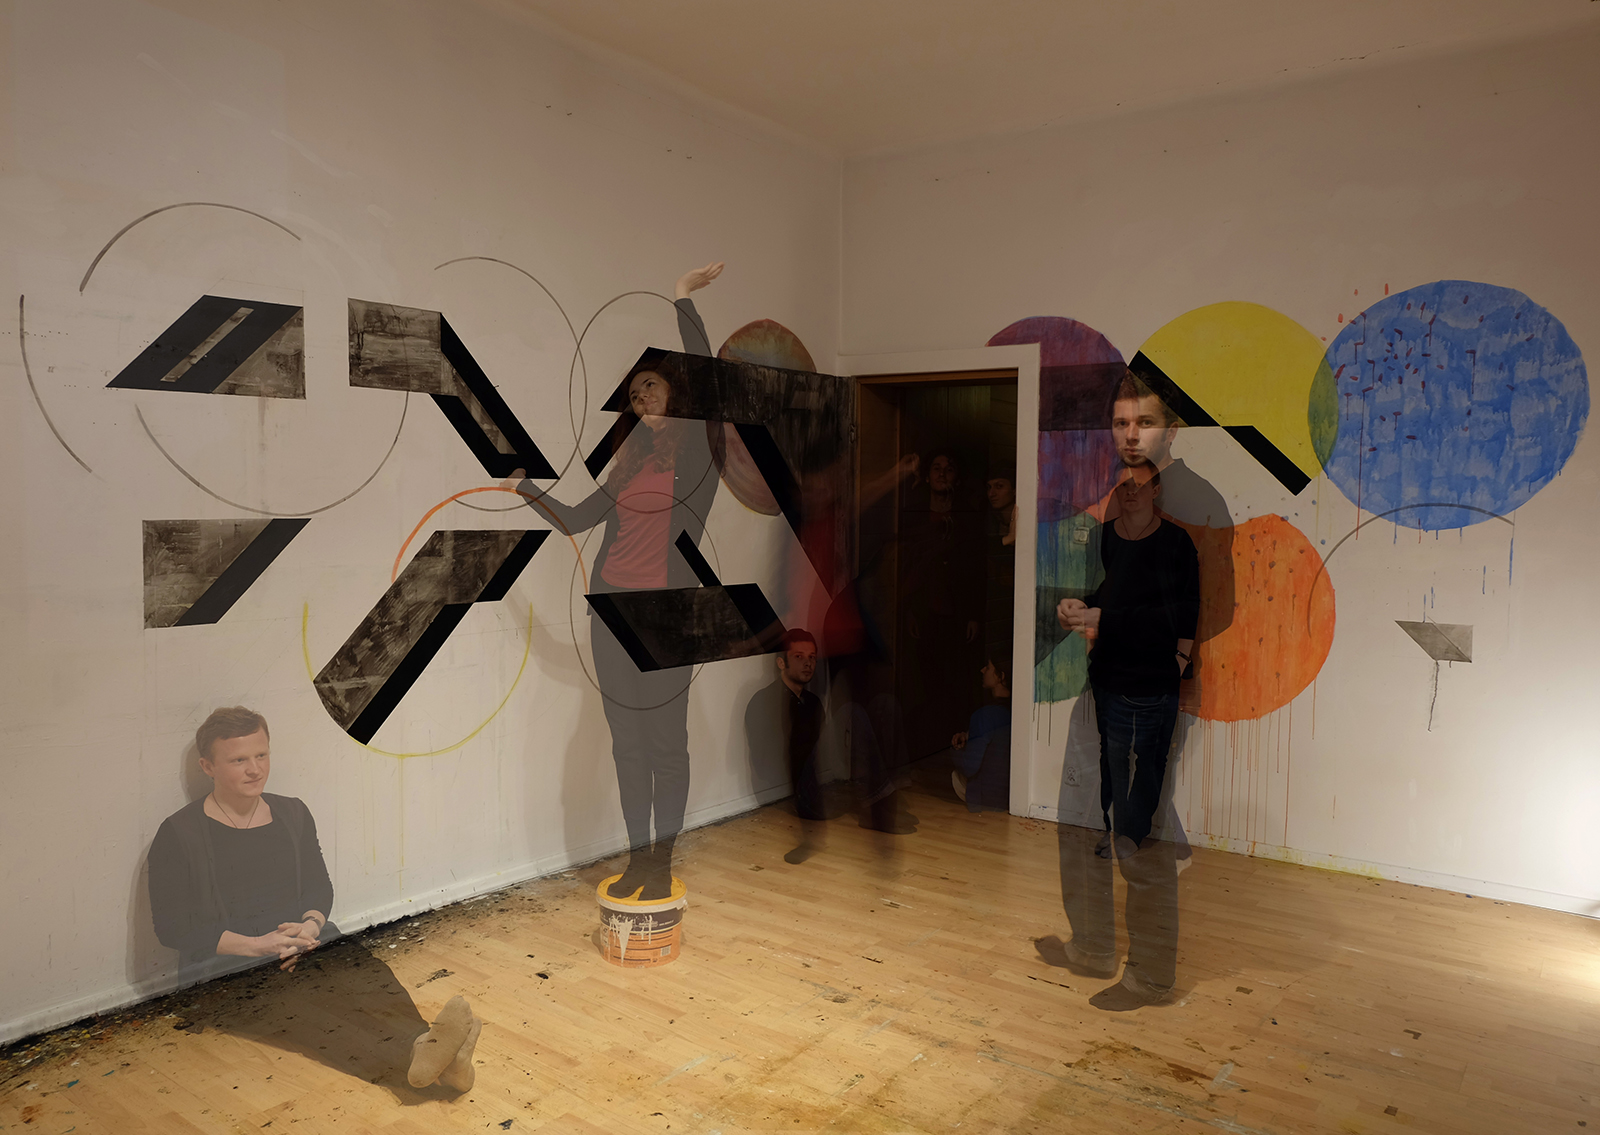 rusin-blazej-serhii-torbinov-peace-project-09